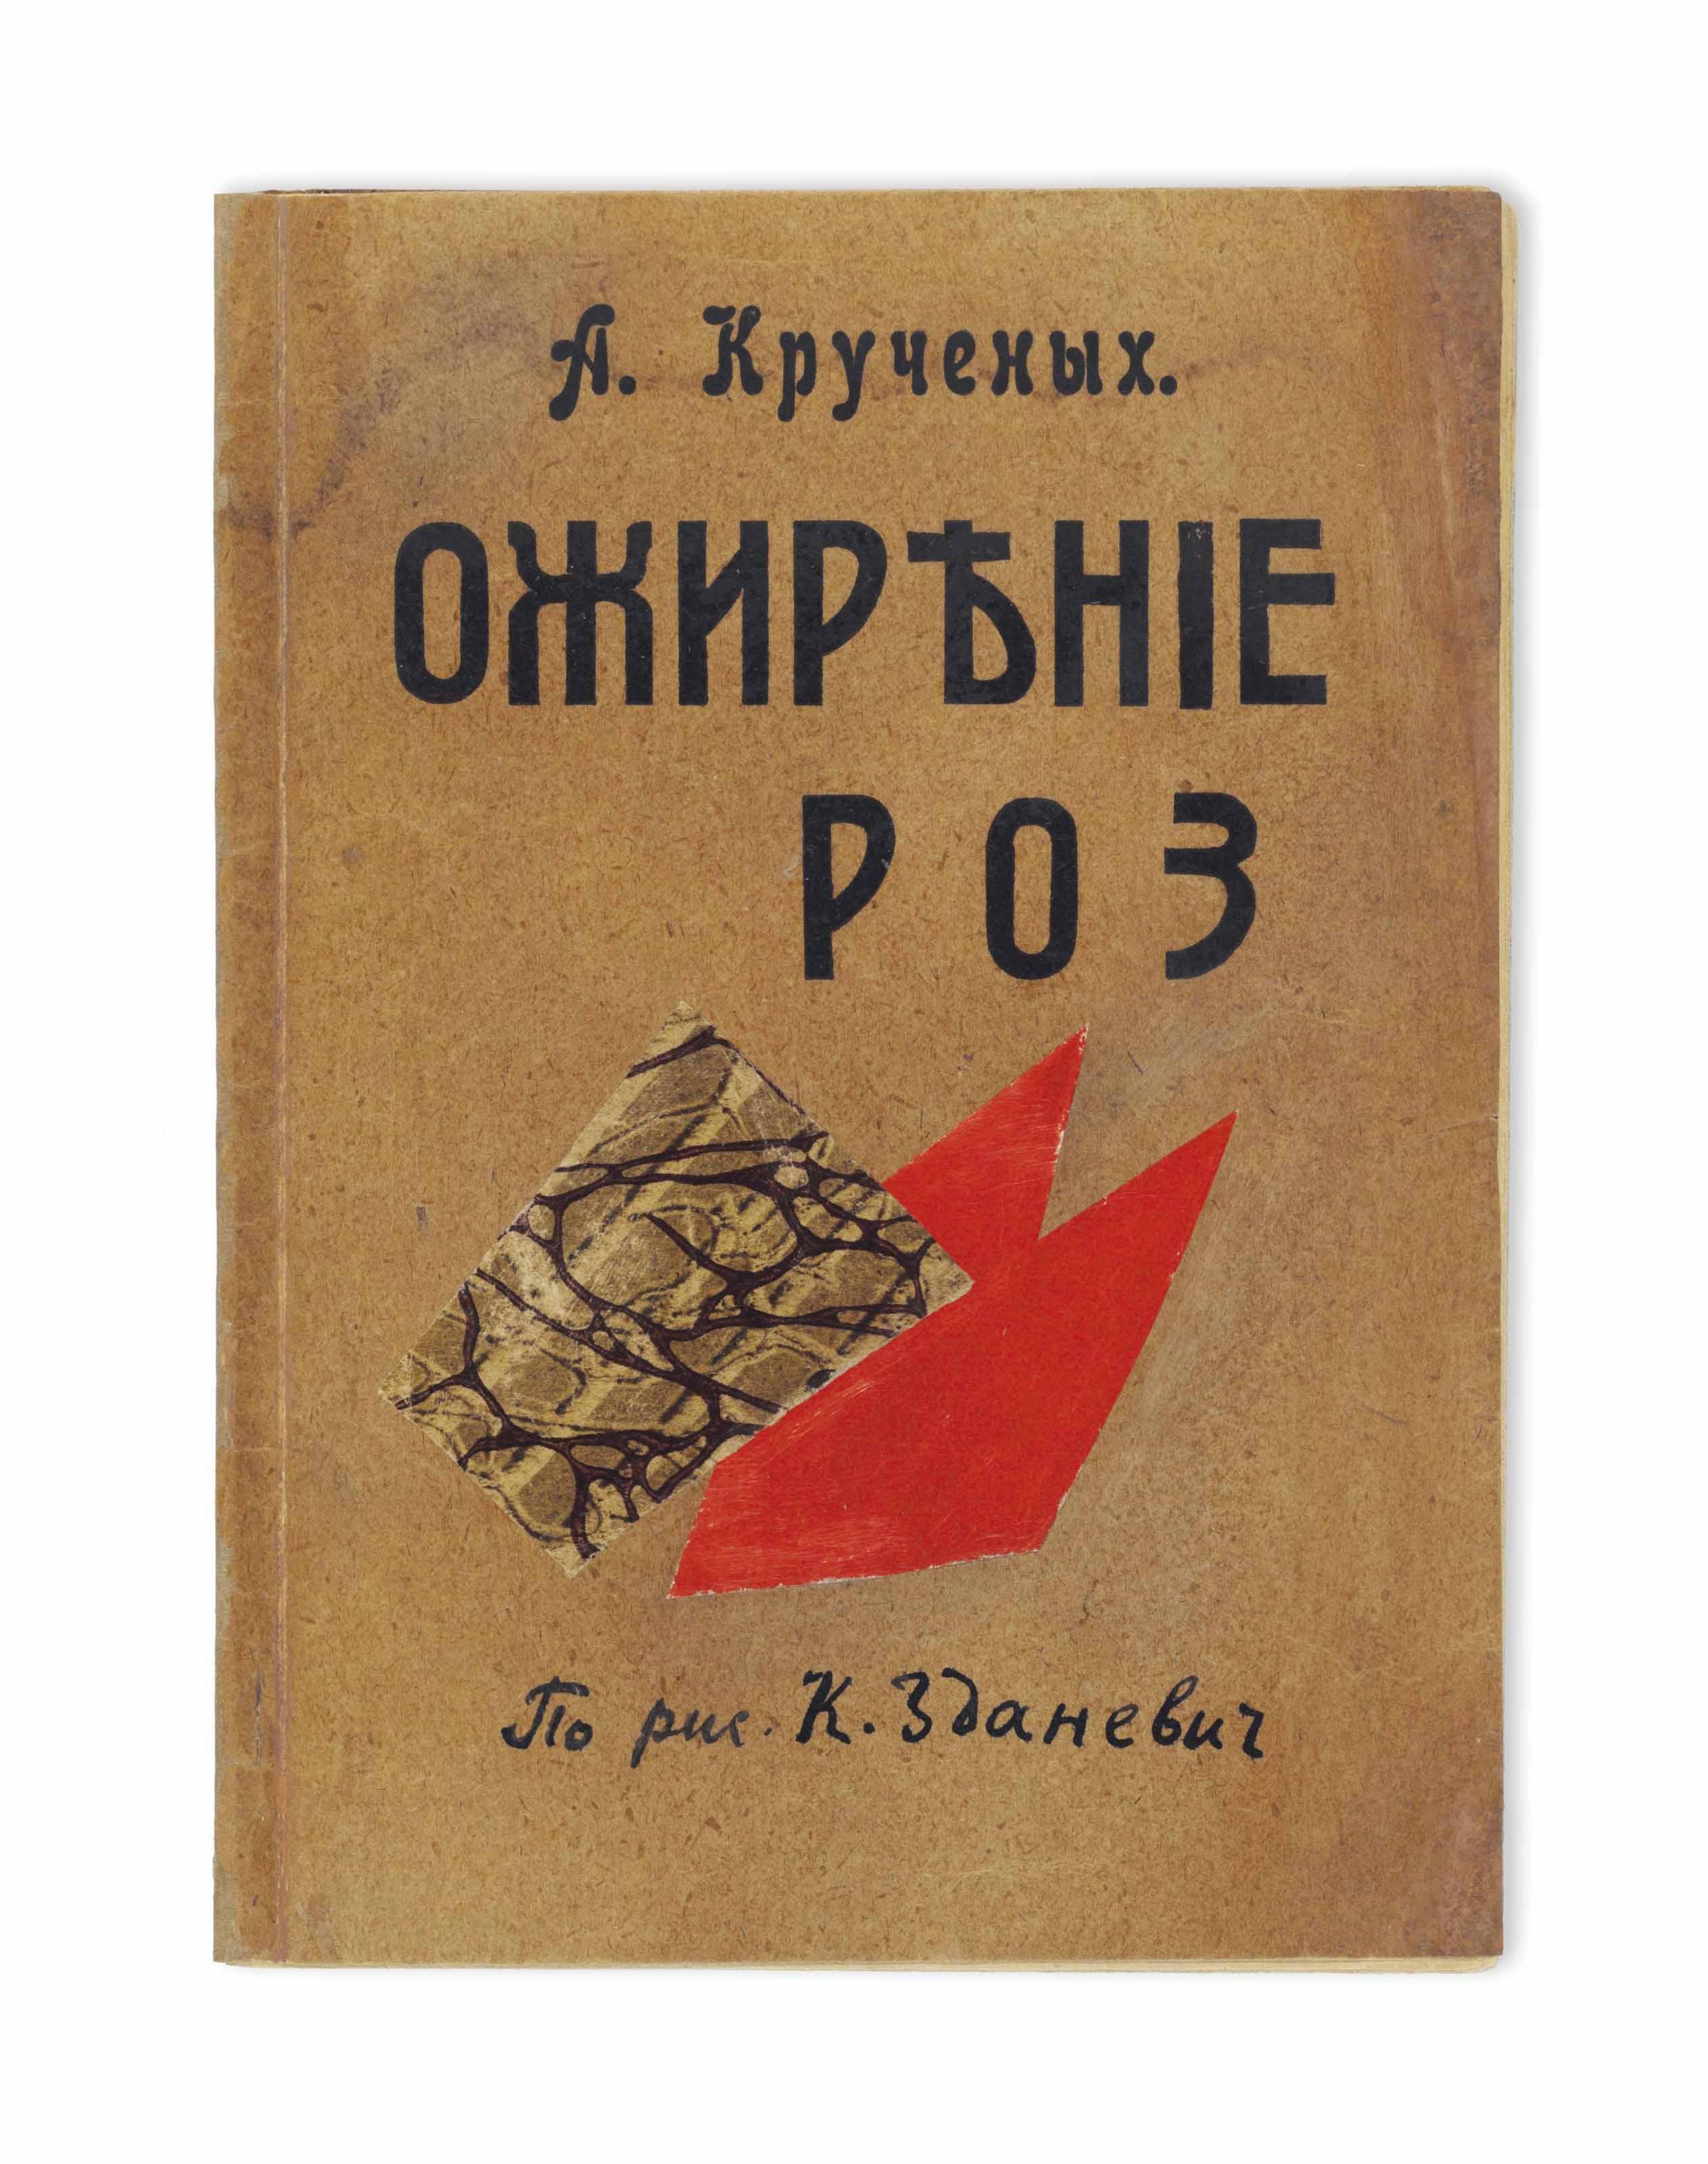 ZDANEVICH, Kirill Mikhailovich